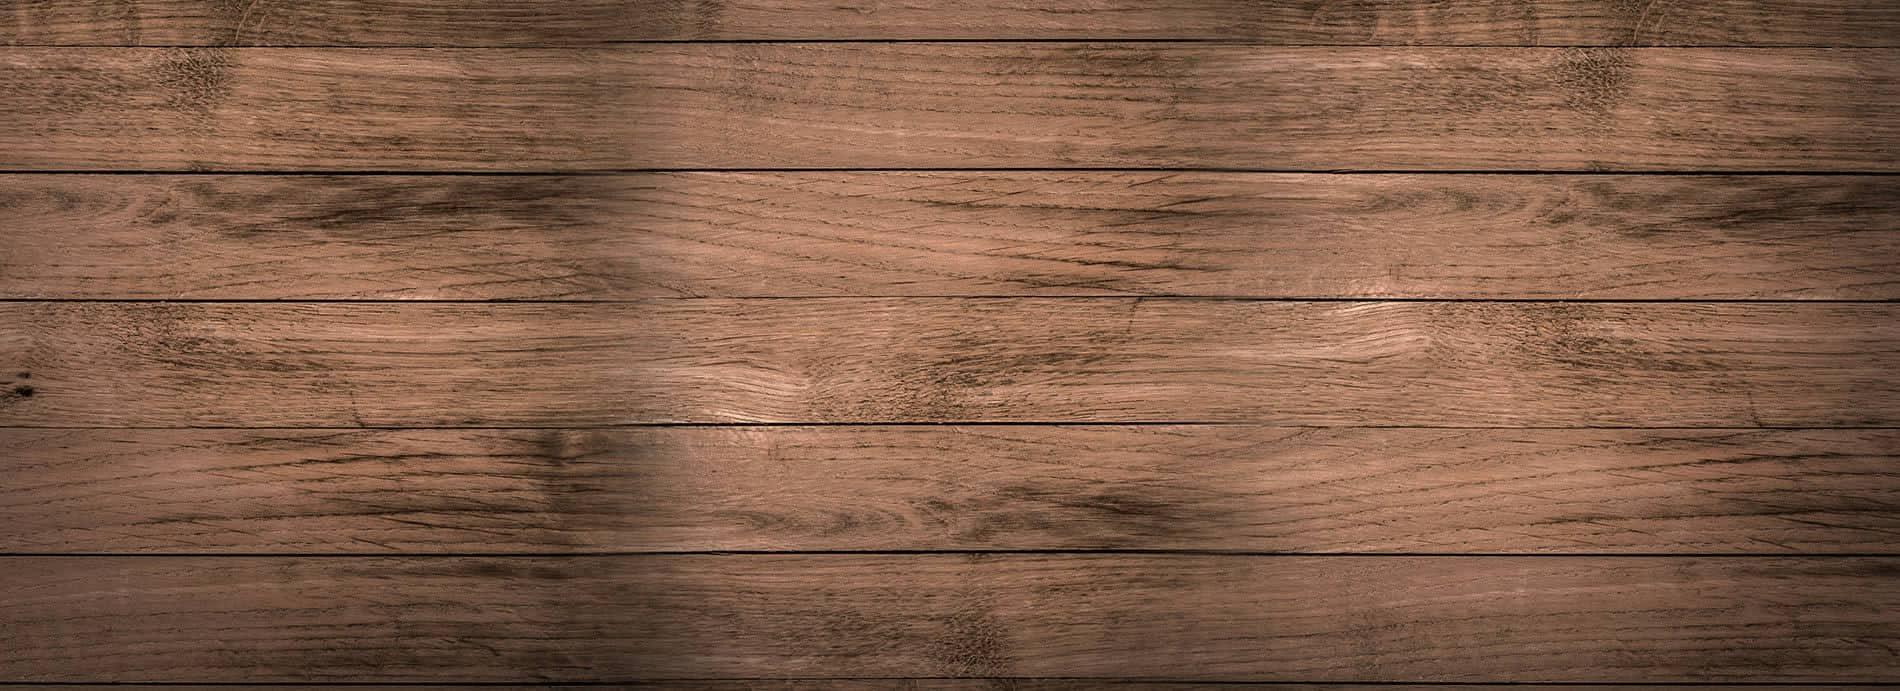 rustic-wood-background-optimized